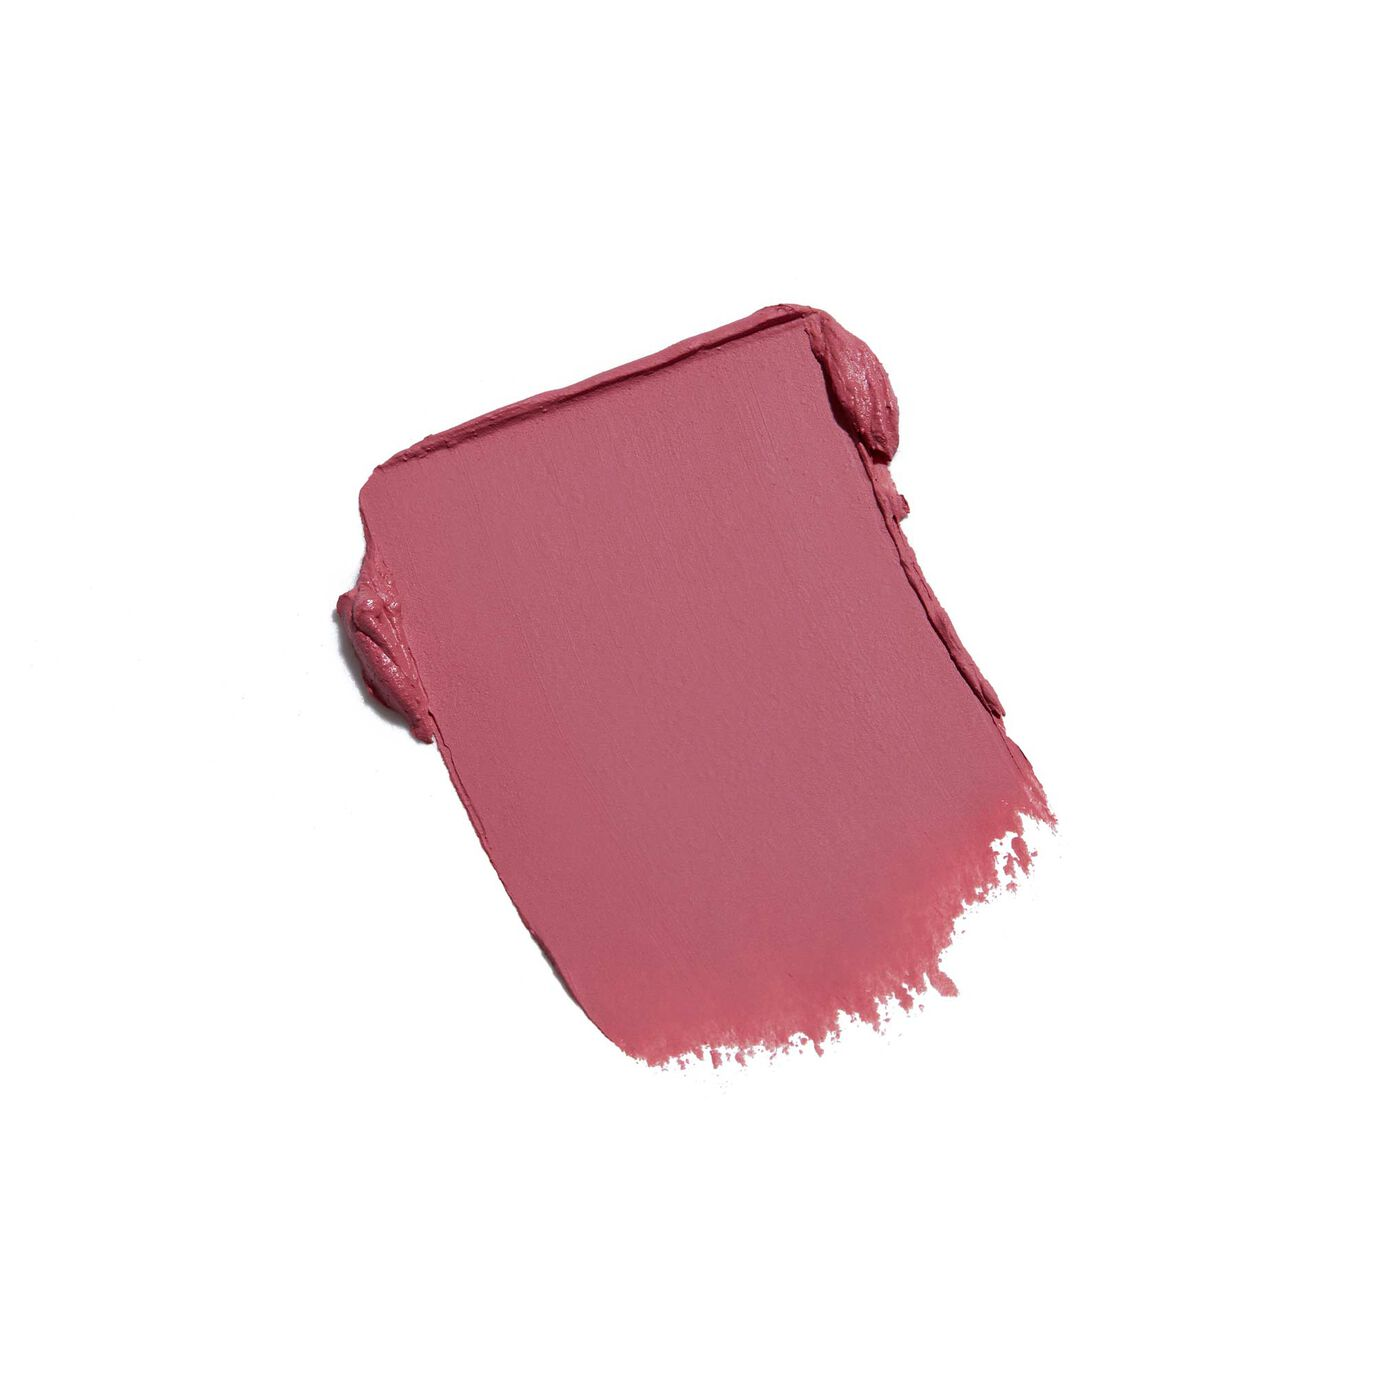 Stick Blush - Pink Dahlia